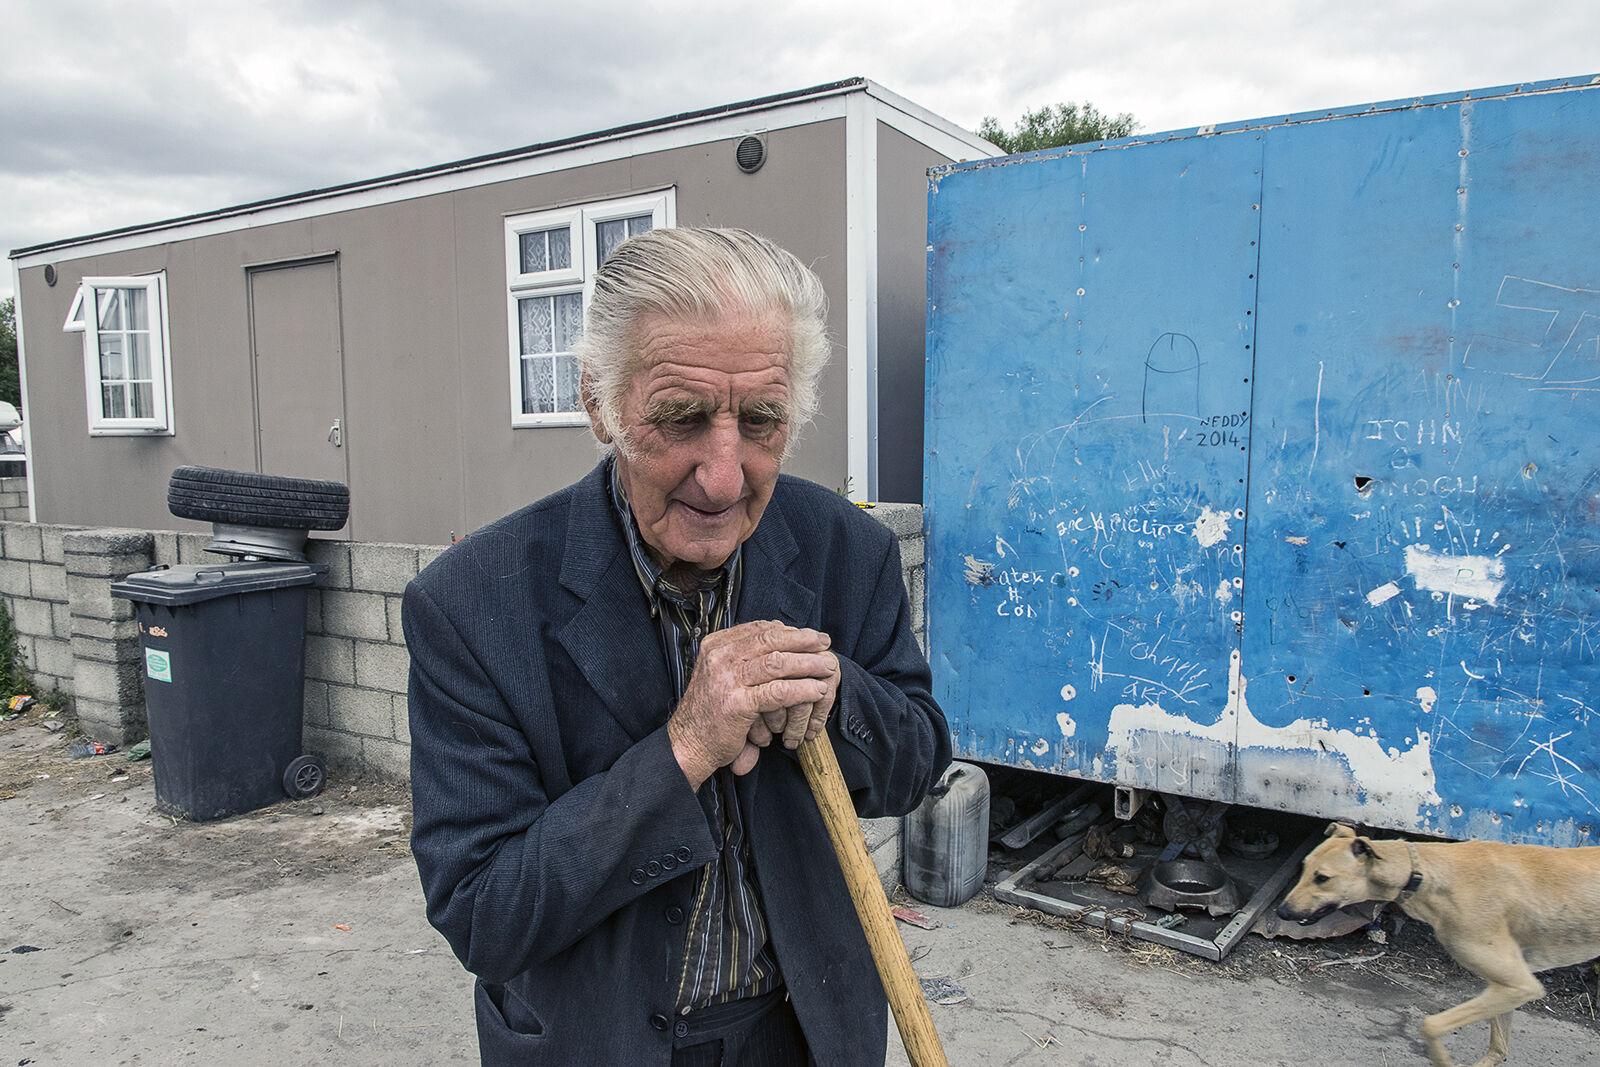 John, 85 years old, Limerick, Ireland 22018